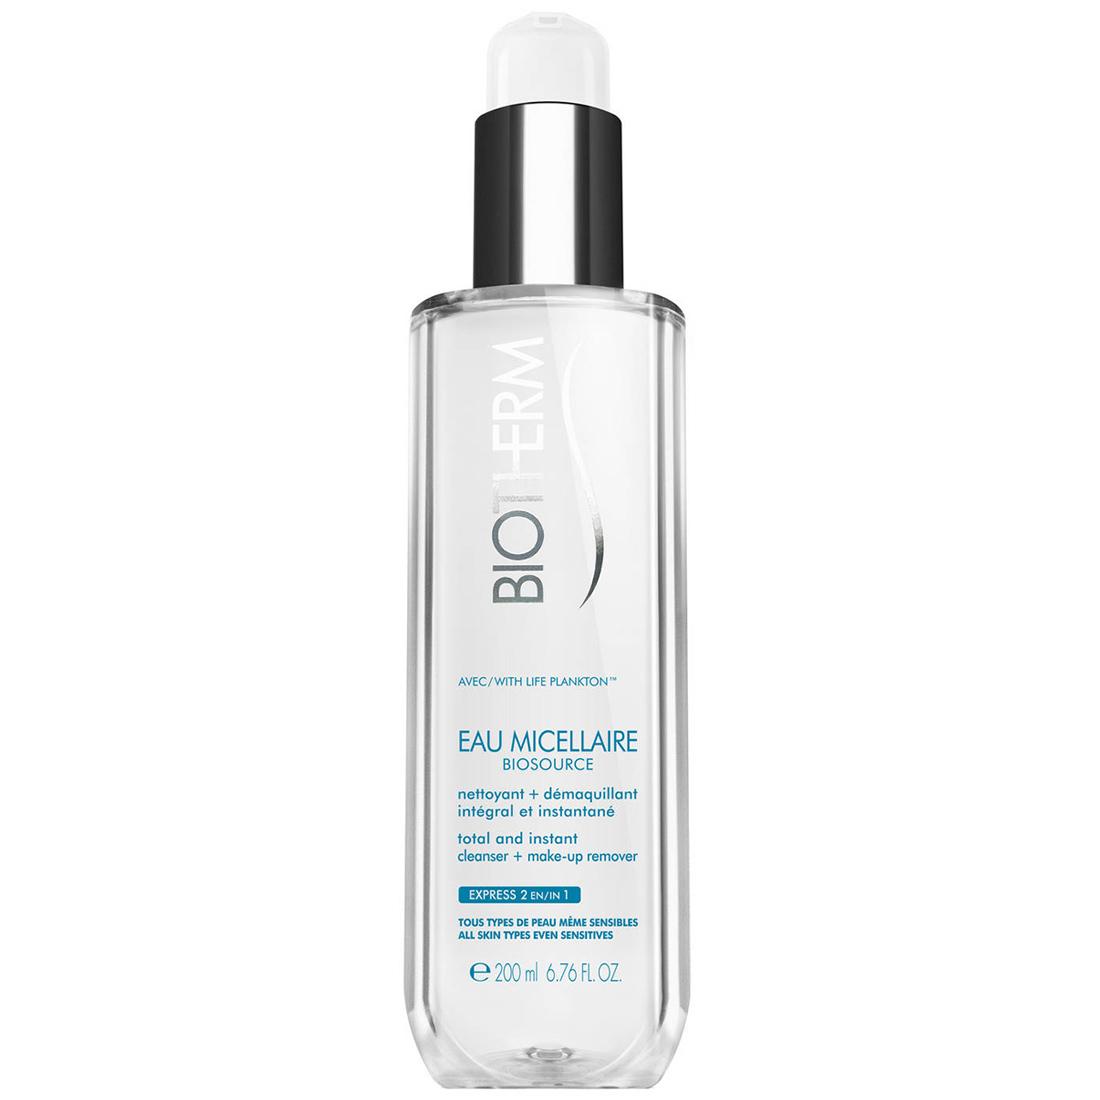 Biotherm - Biosource Eau Micellaire - 200 ml